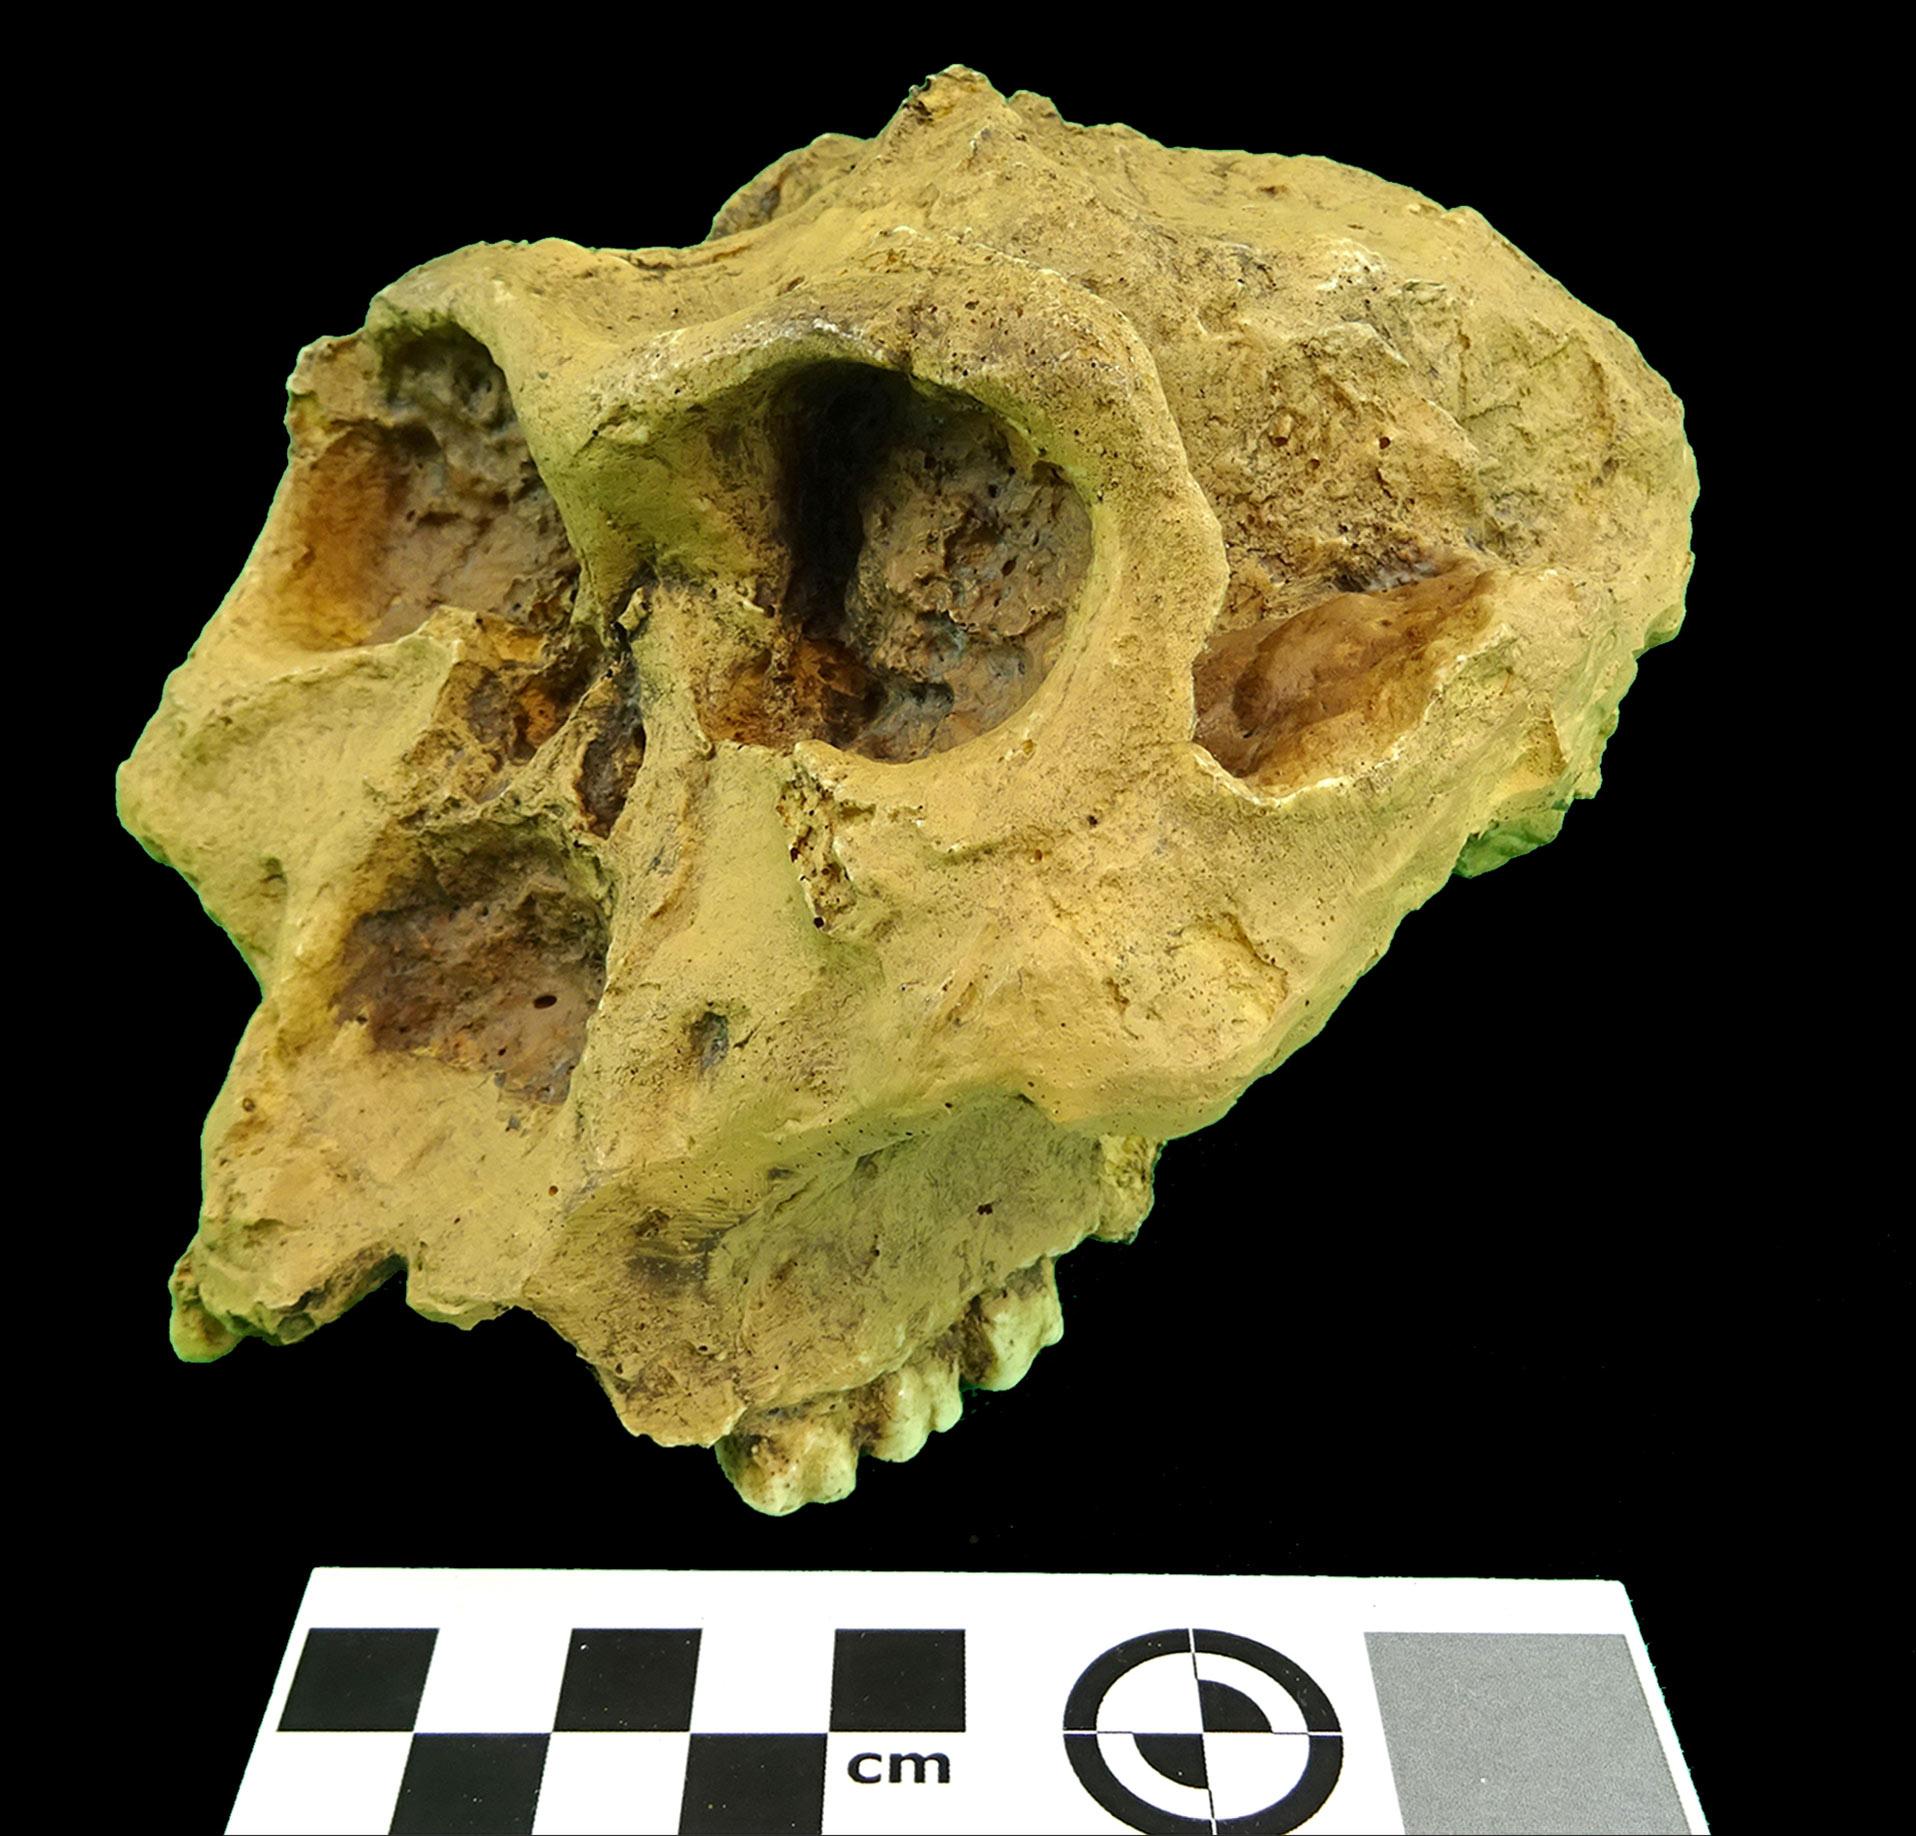 Rèplica en resina de Paranthropus robustus (MGUV 22818) del MUVHN